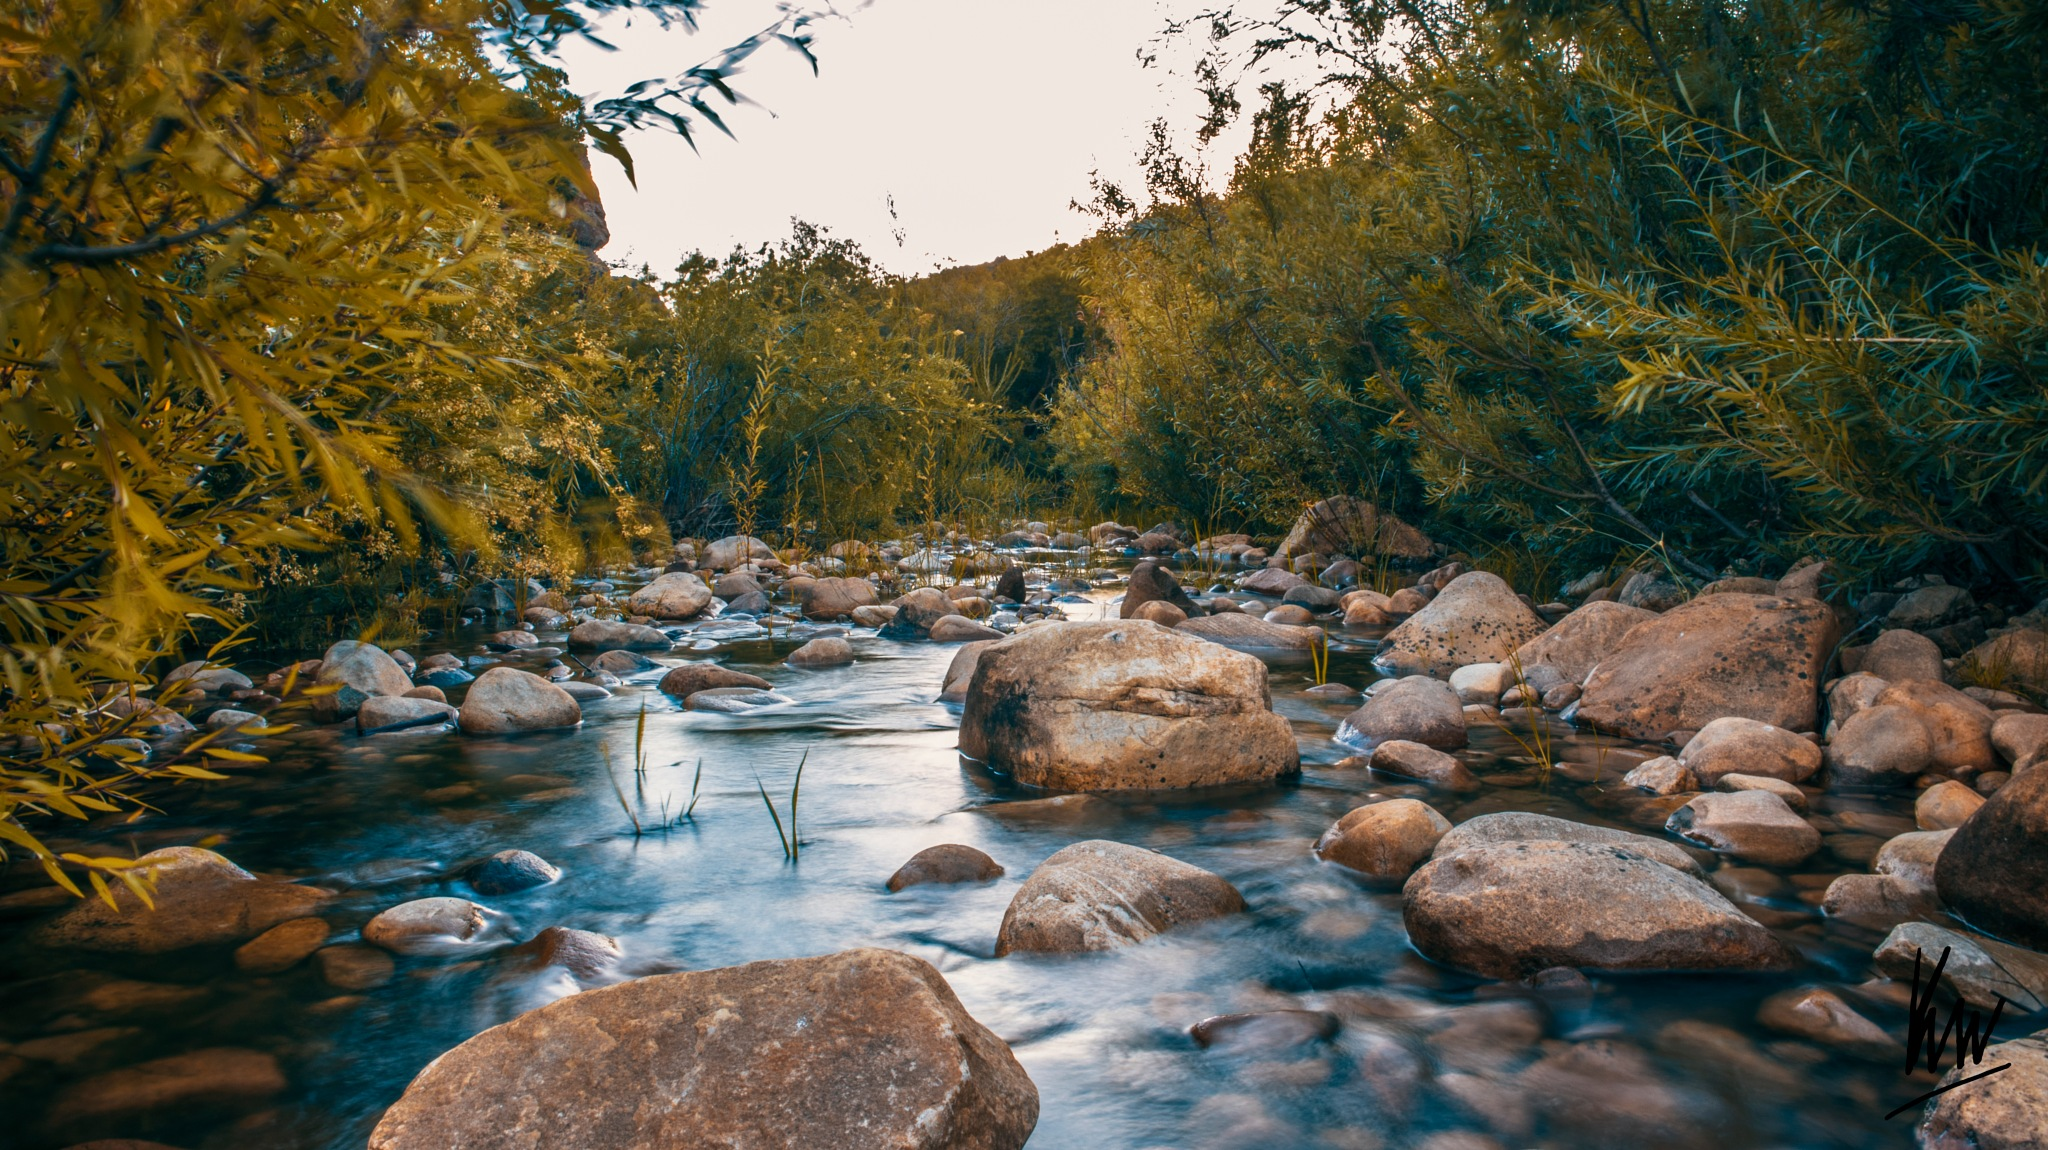 Autumn River by Ken Ward